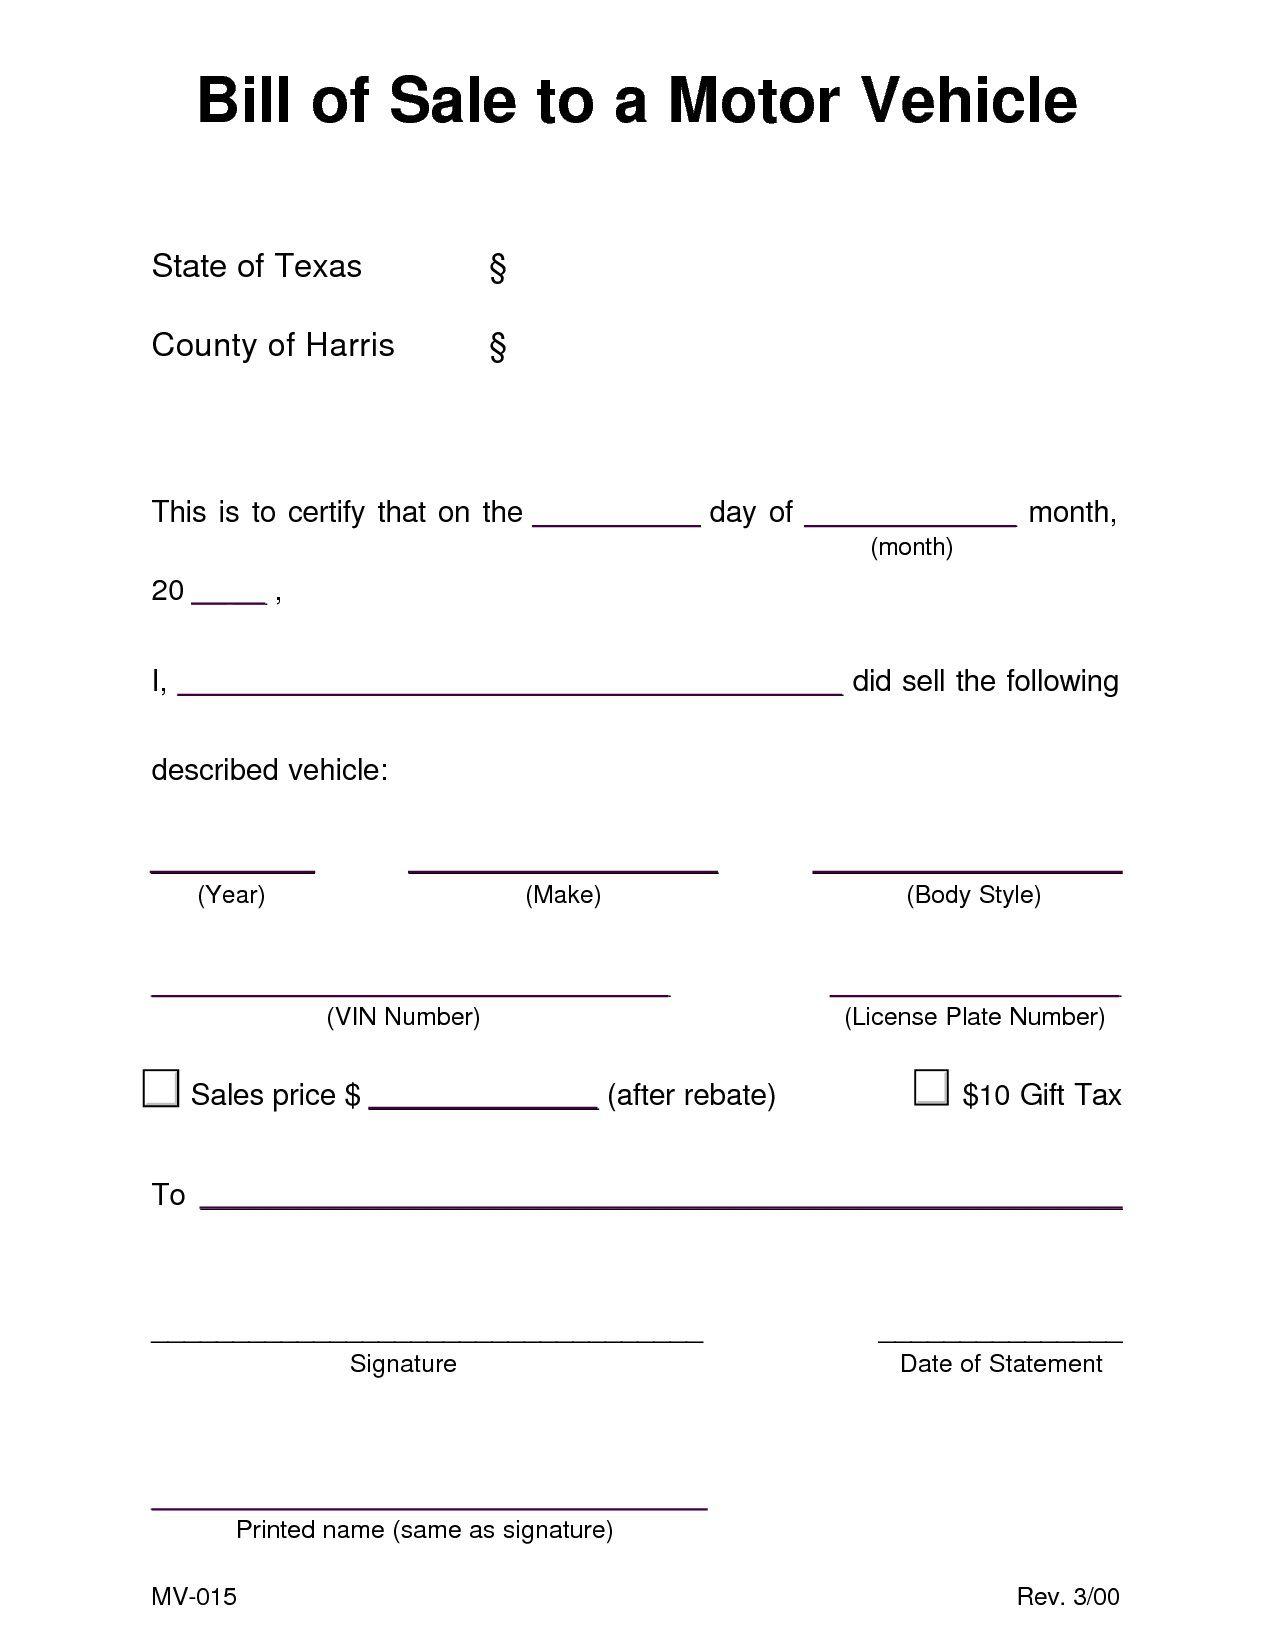 001 Shocking Bill Of Sale Template Texa Concept  Texas Free Car Form Dmv DocumentFull